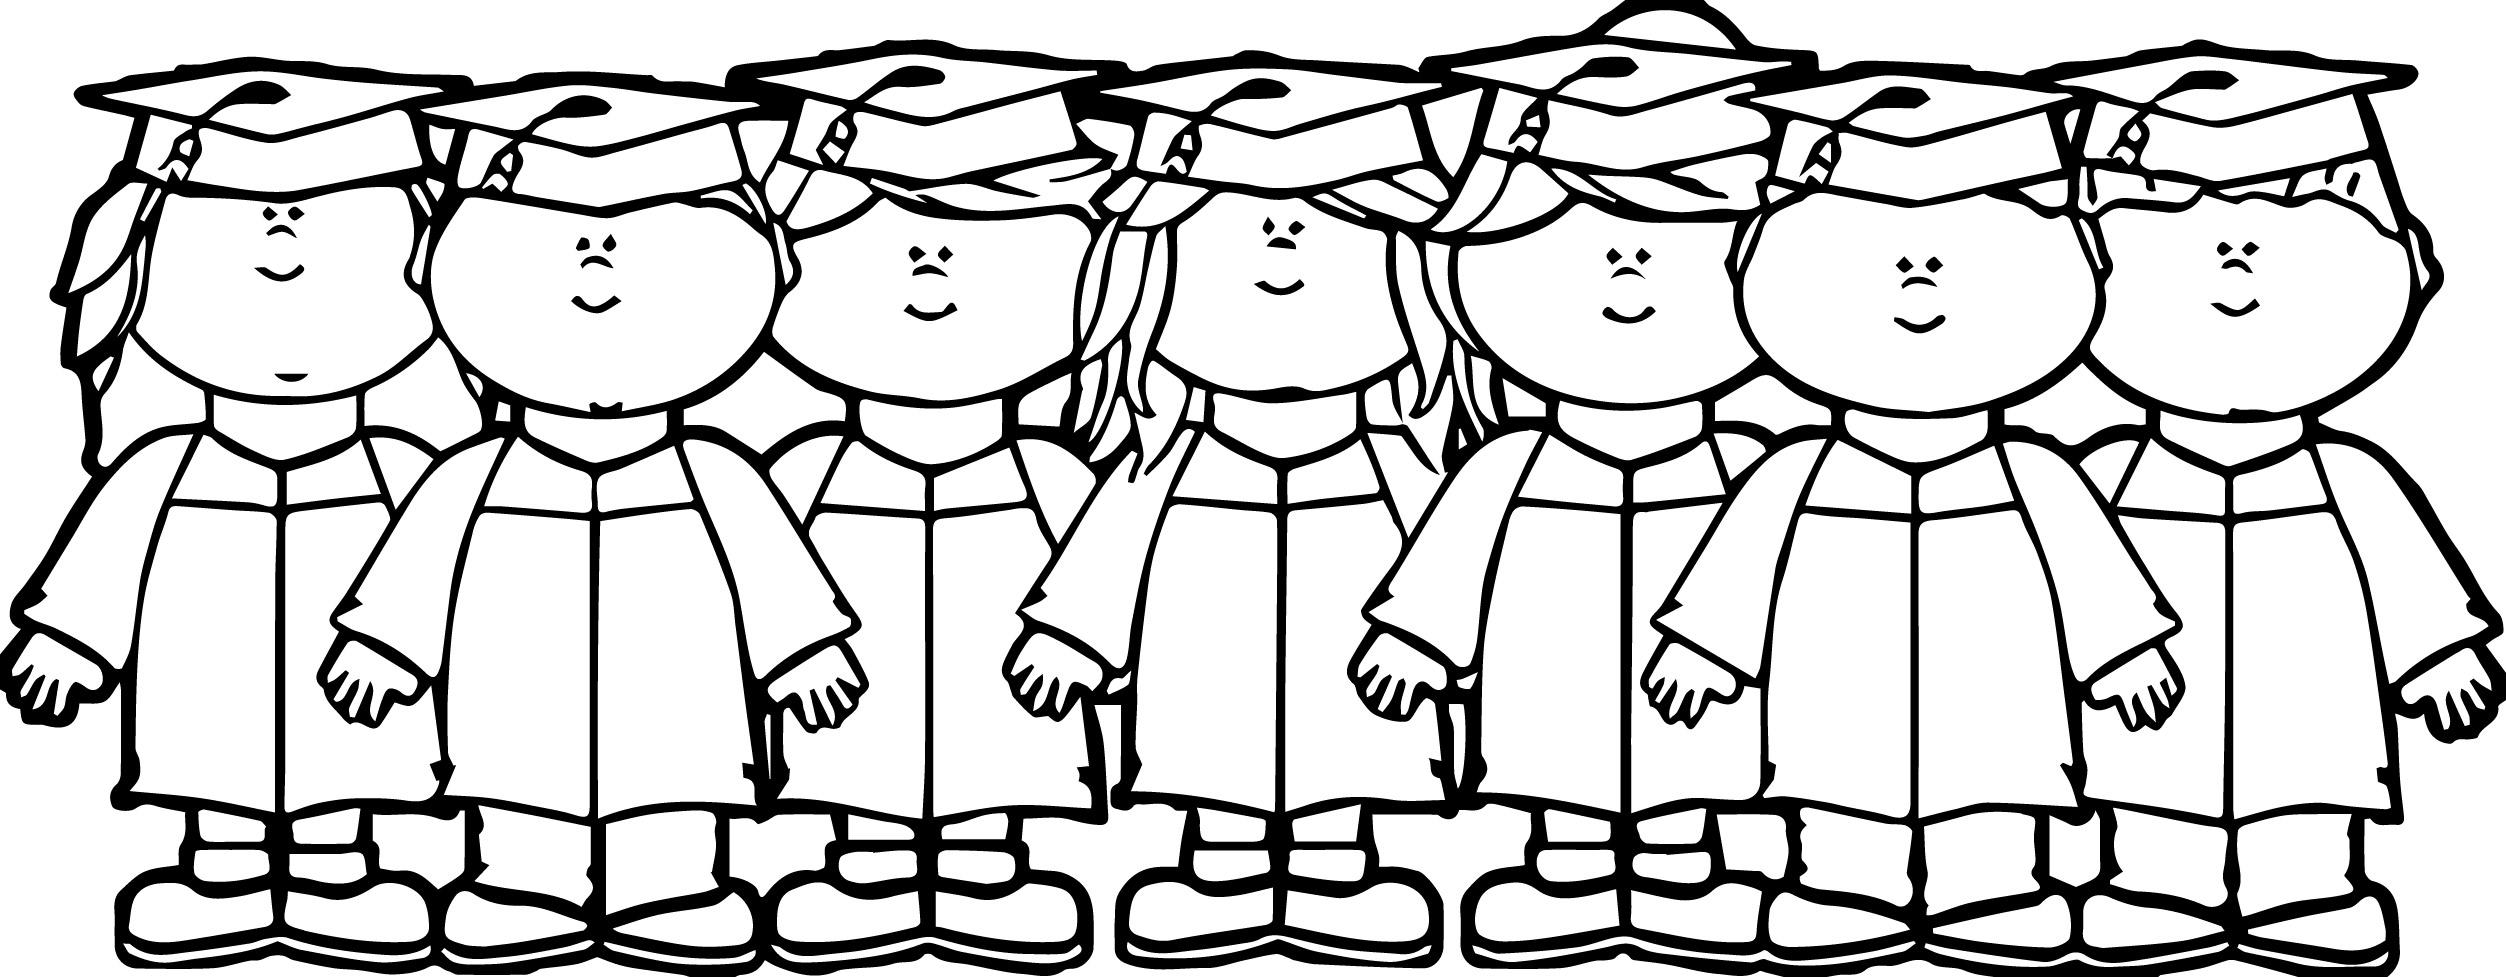 Free Graduation Black Cliparts, Download Free Clip Art, Free.